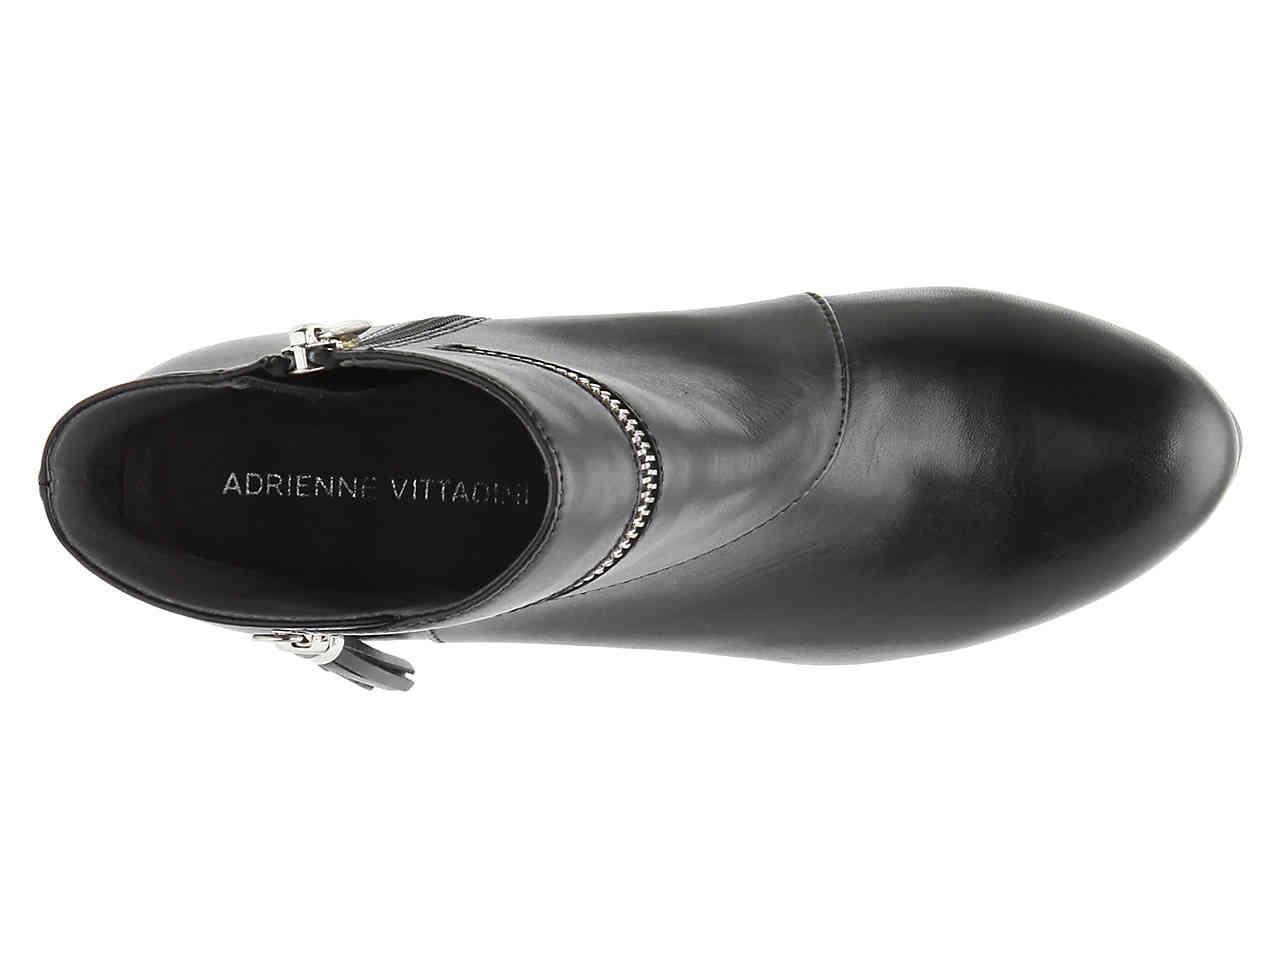 40f8217ce56 Lyst - Adrienne Vittadini Plake Platform Bootie in Black